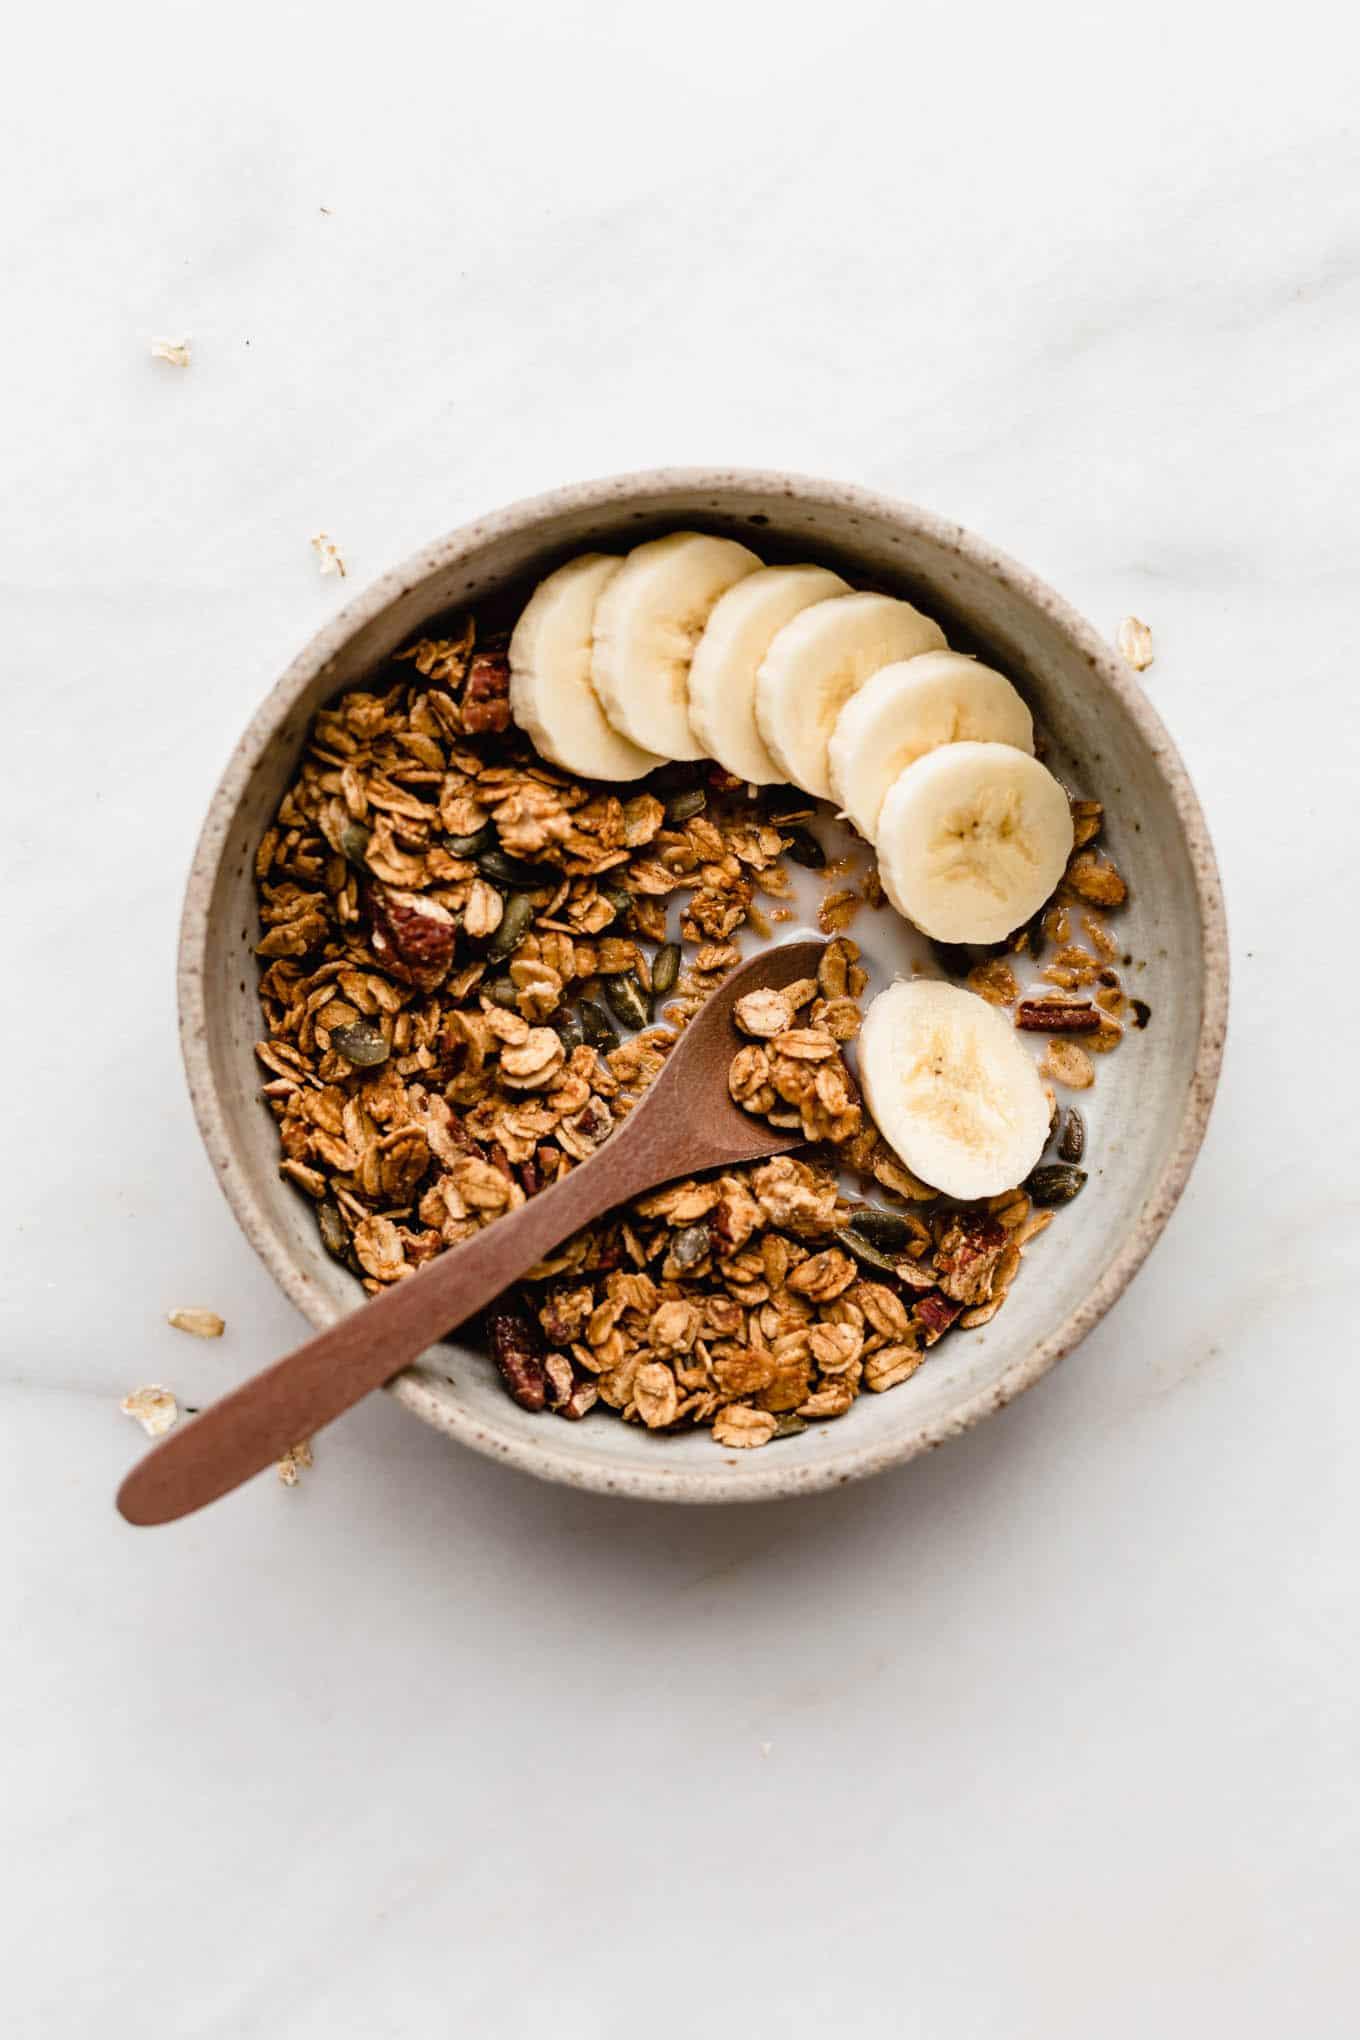 healthy pumpkin desserts - pumpkin granola with bananas in a bowl